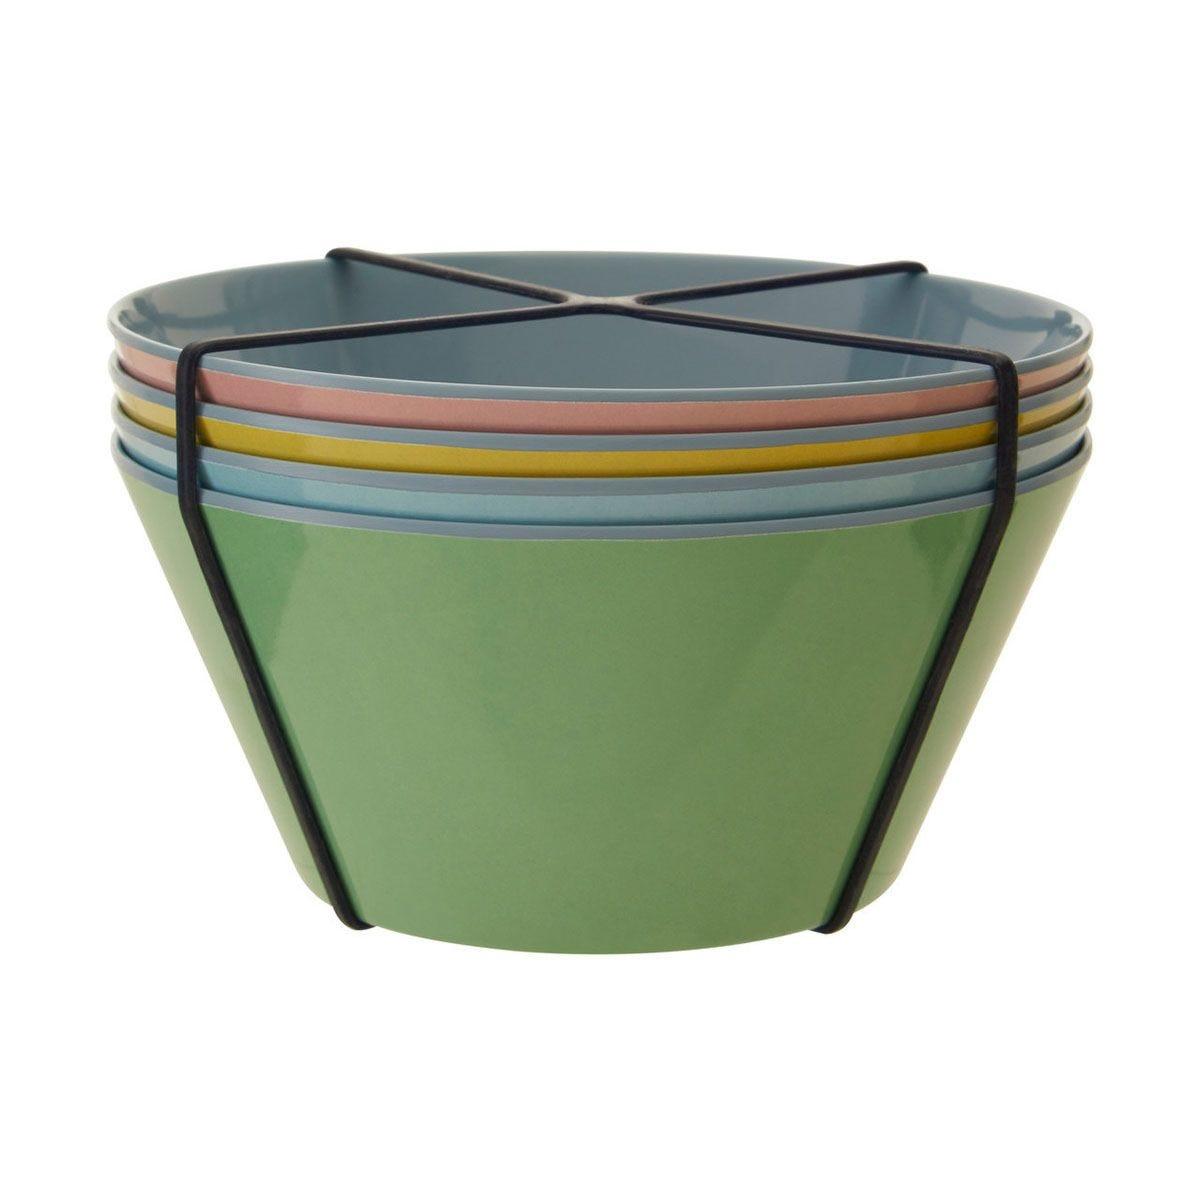 Maison By Premier Mimo Set of 4 Melamine Bowls - Multi